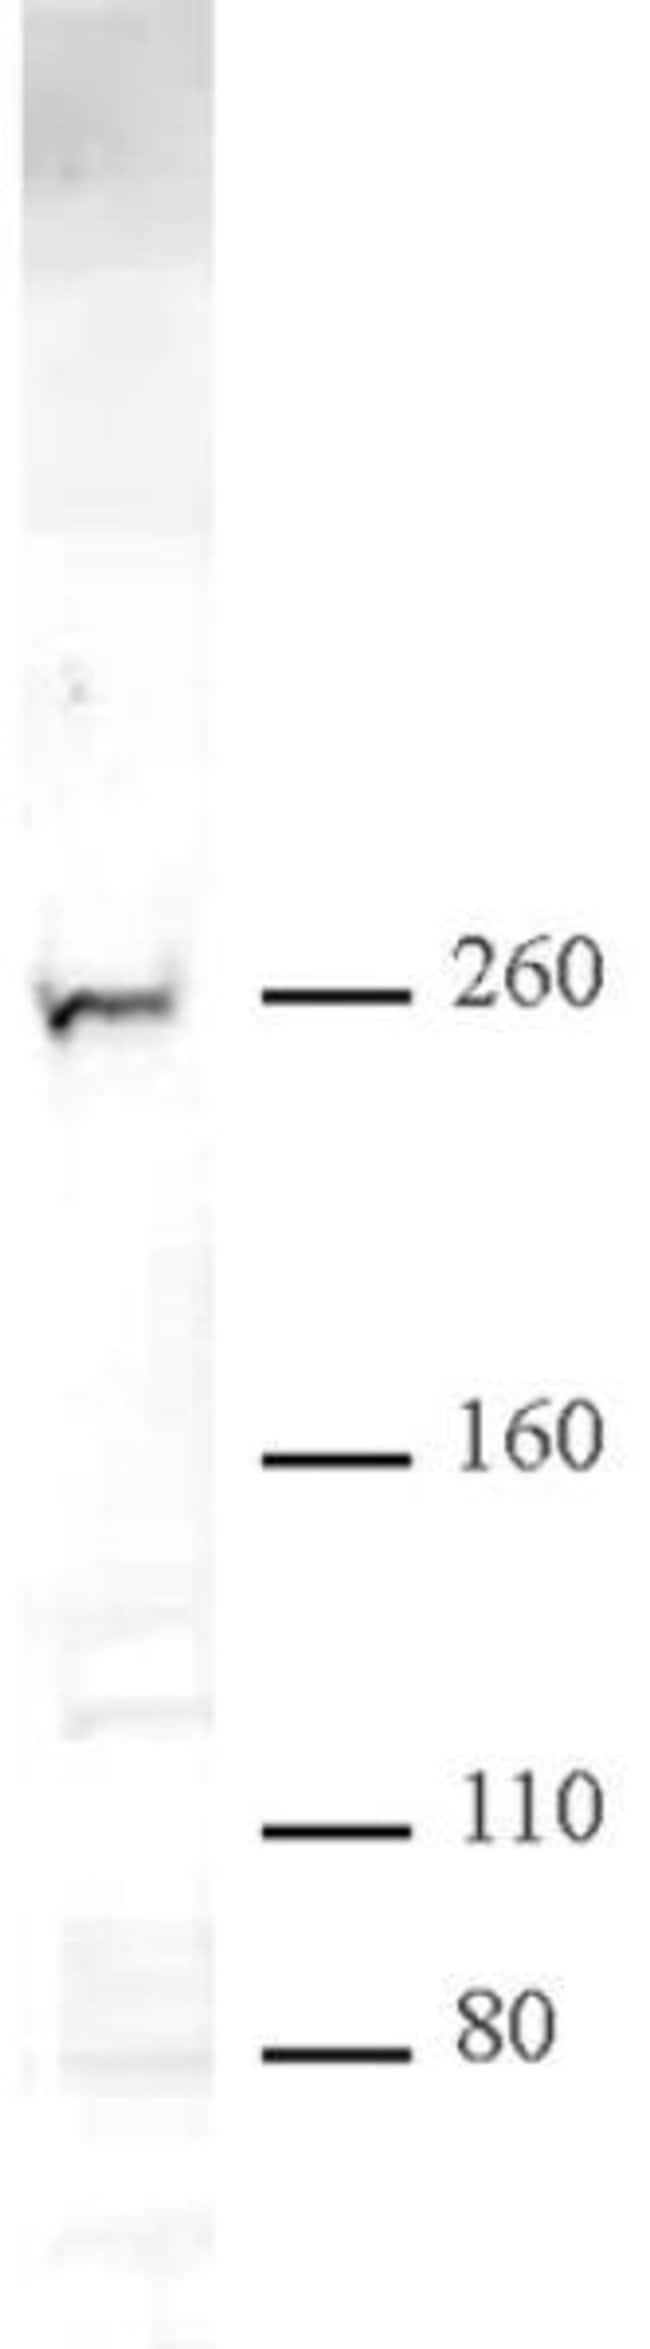 CHD2 Rabbit anti-Human, Unconjugated, Polyclonal, Active Motif:Antibodies:Primary